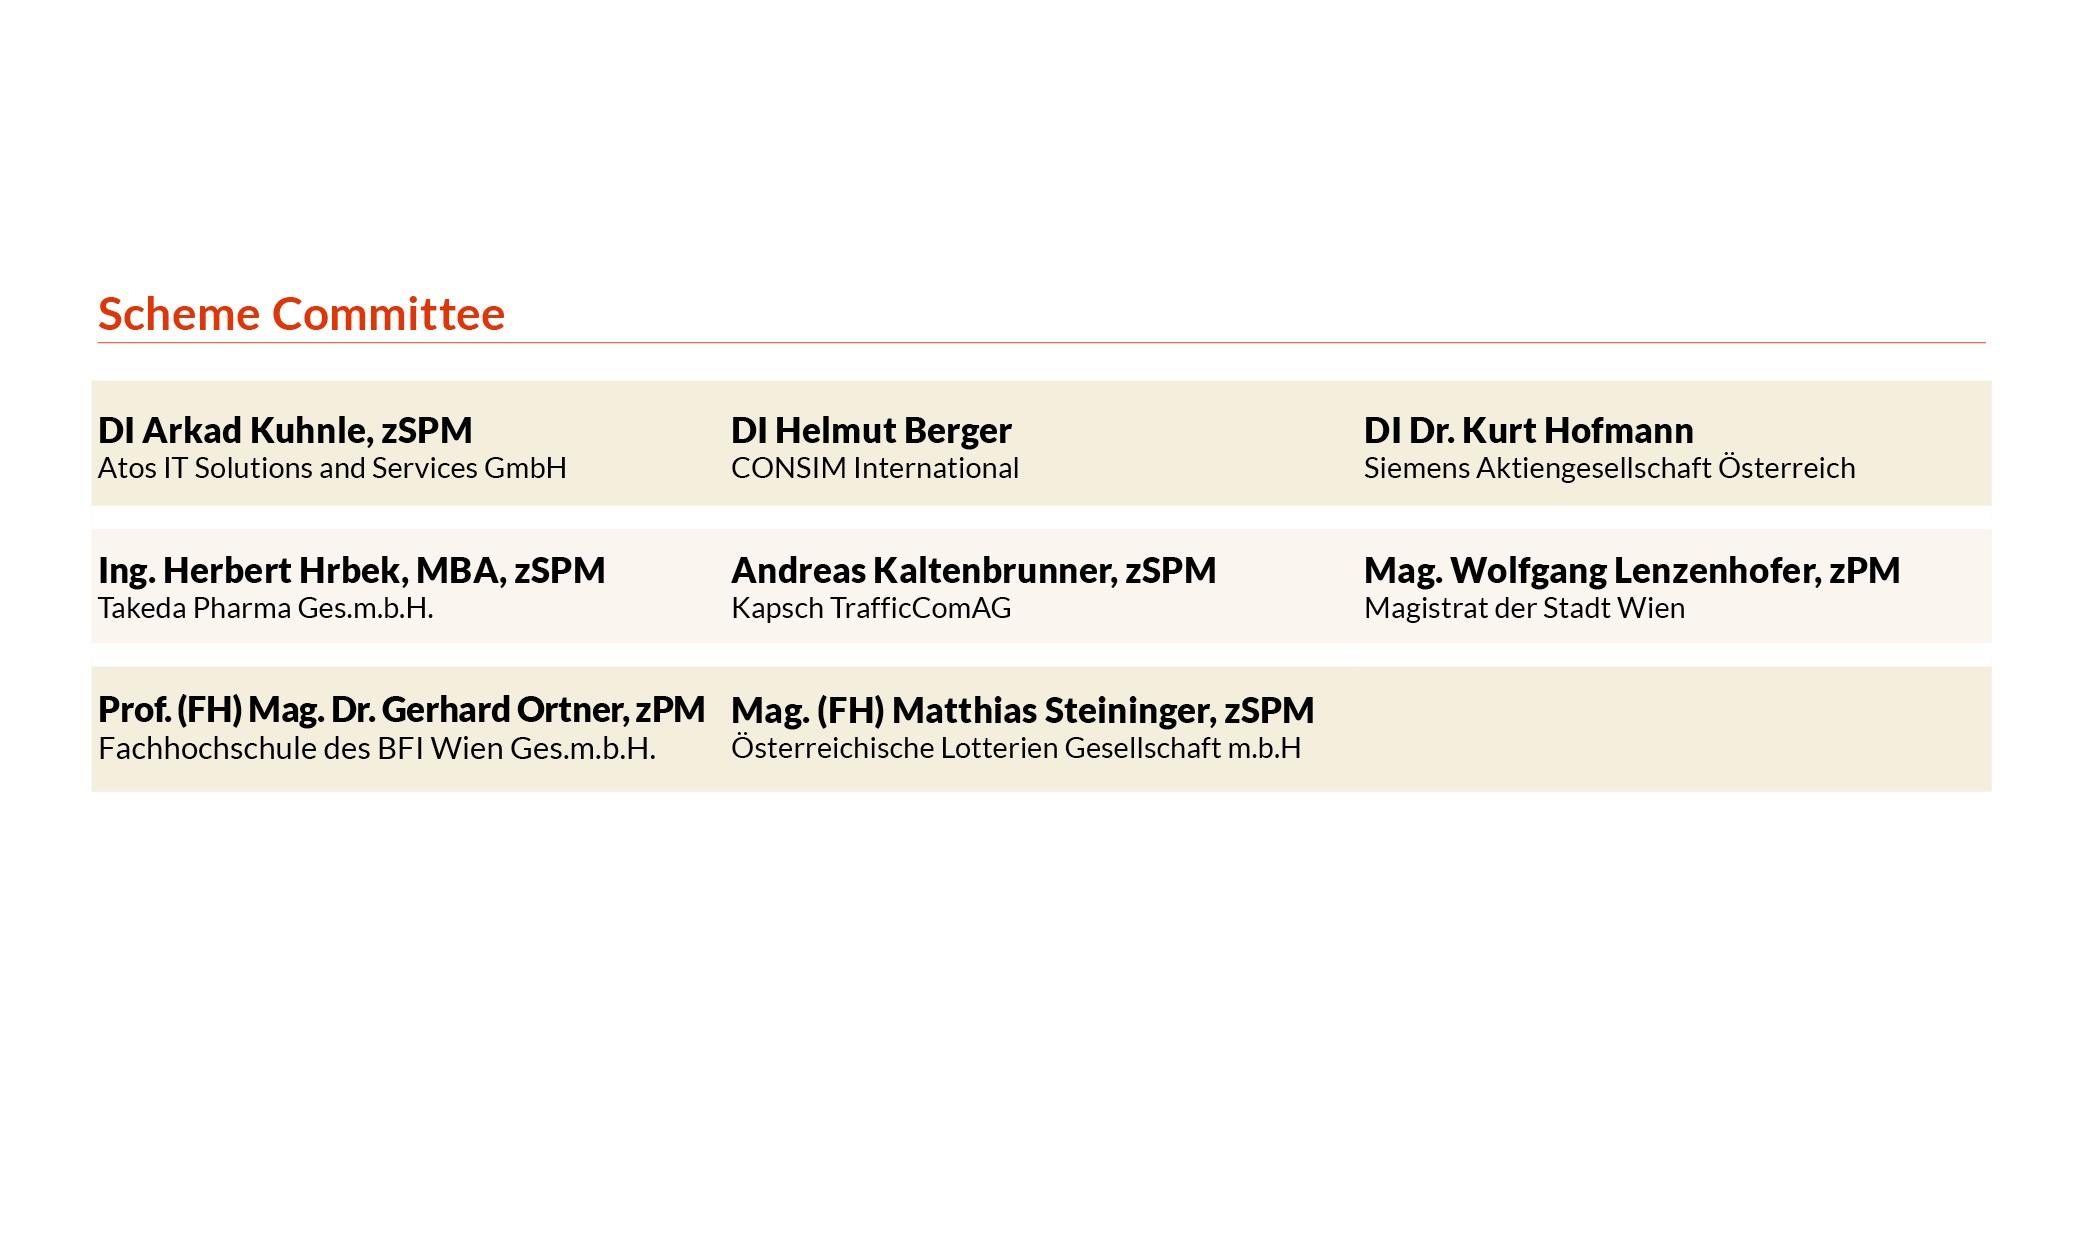 pma Scheme Committee